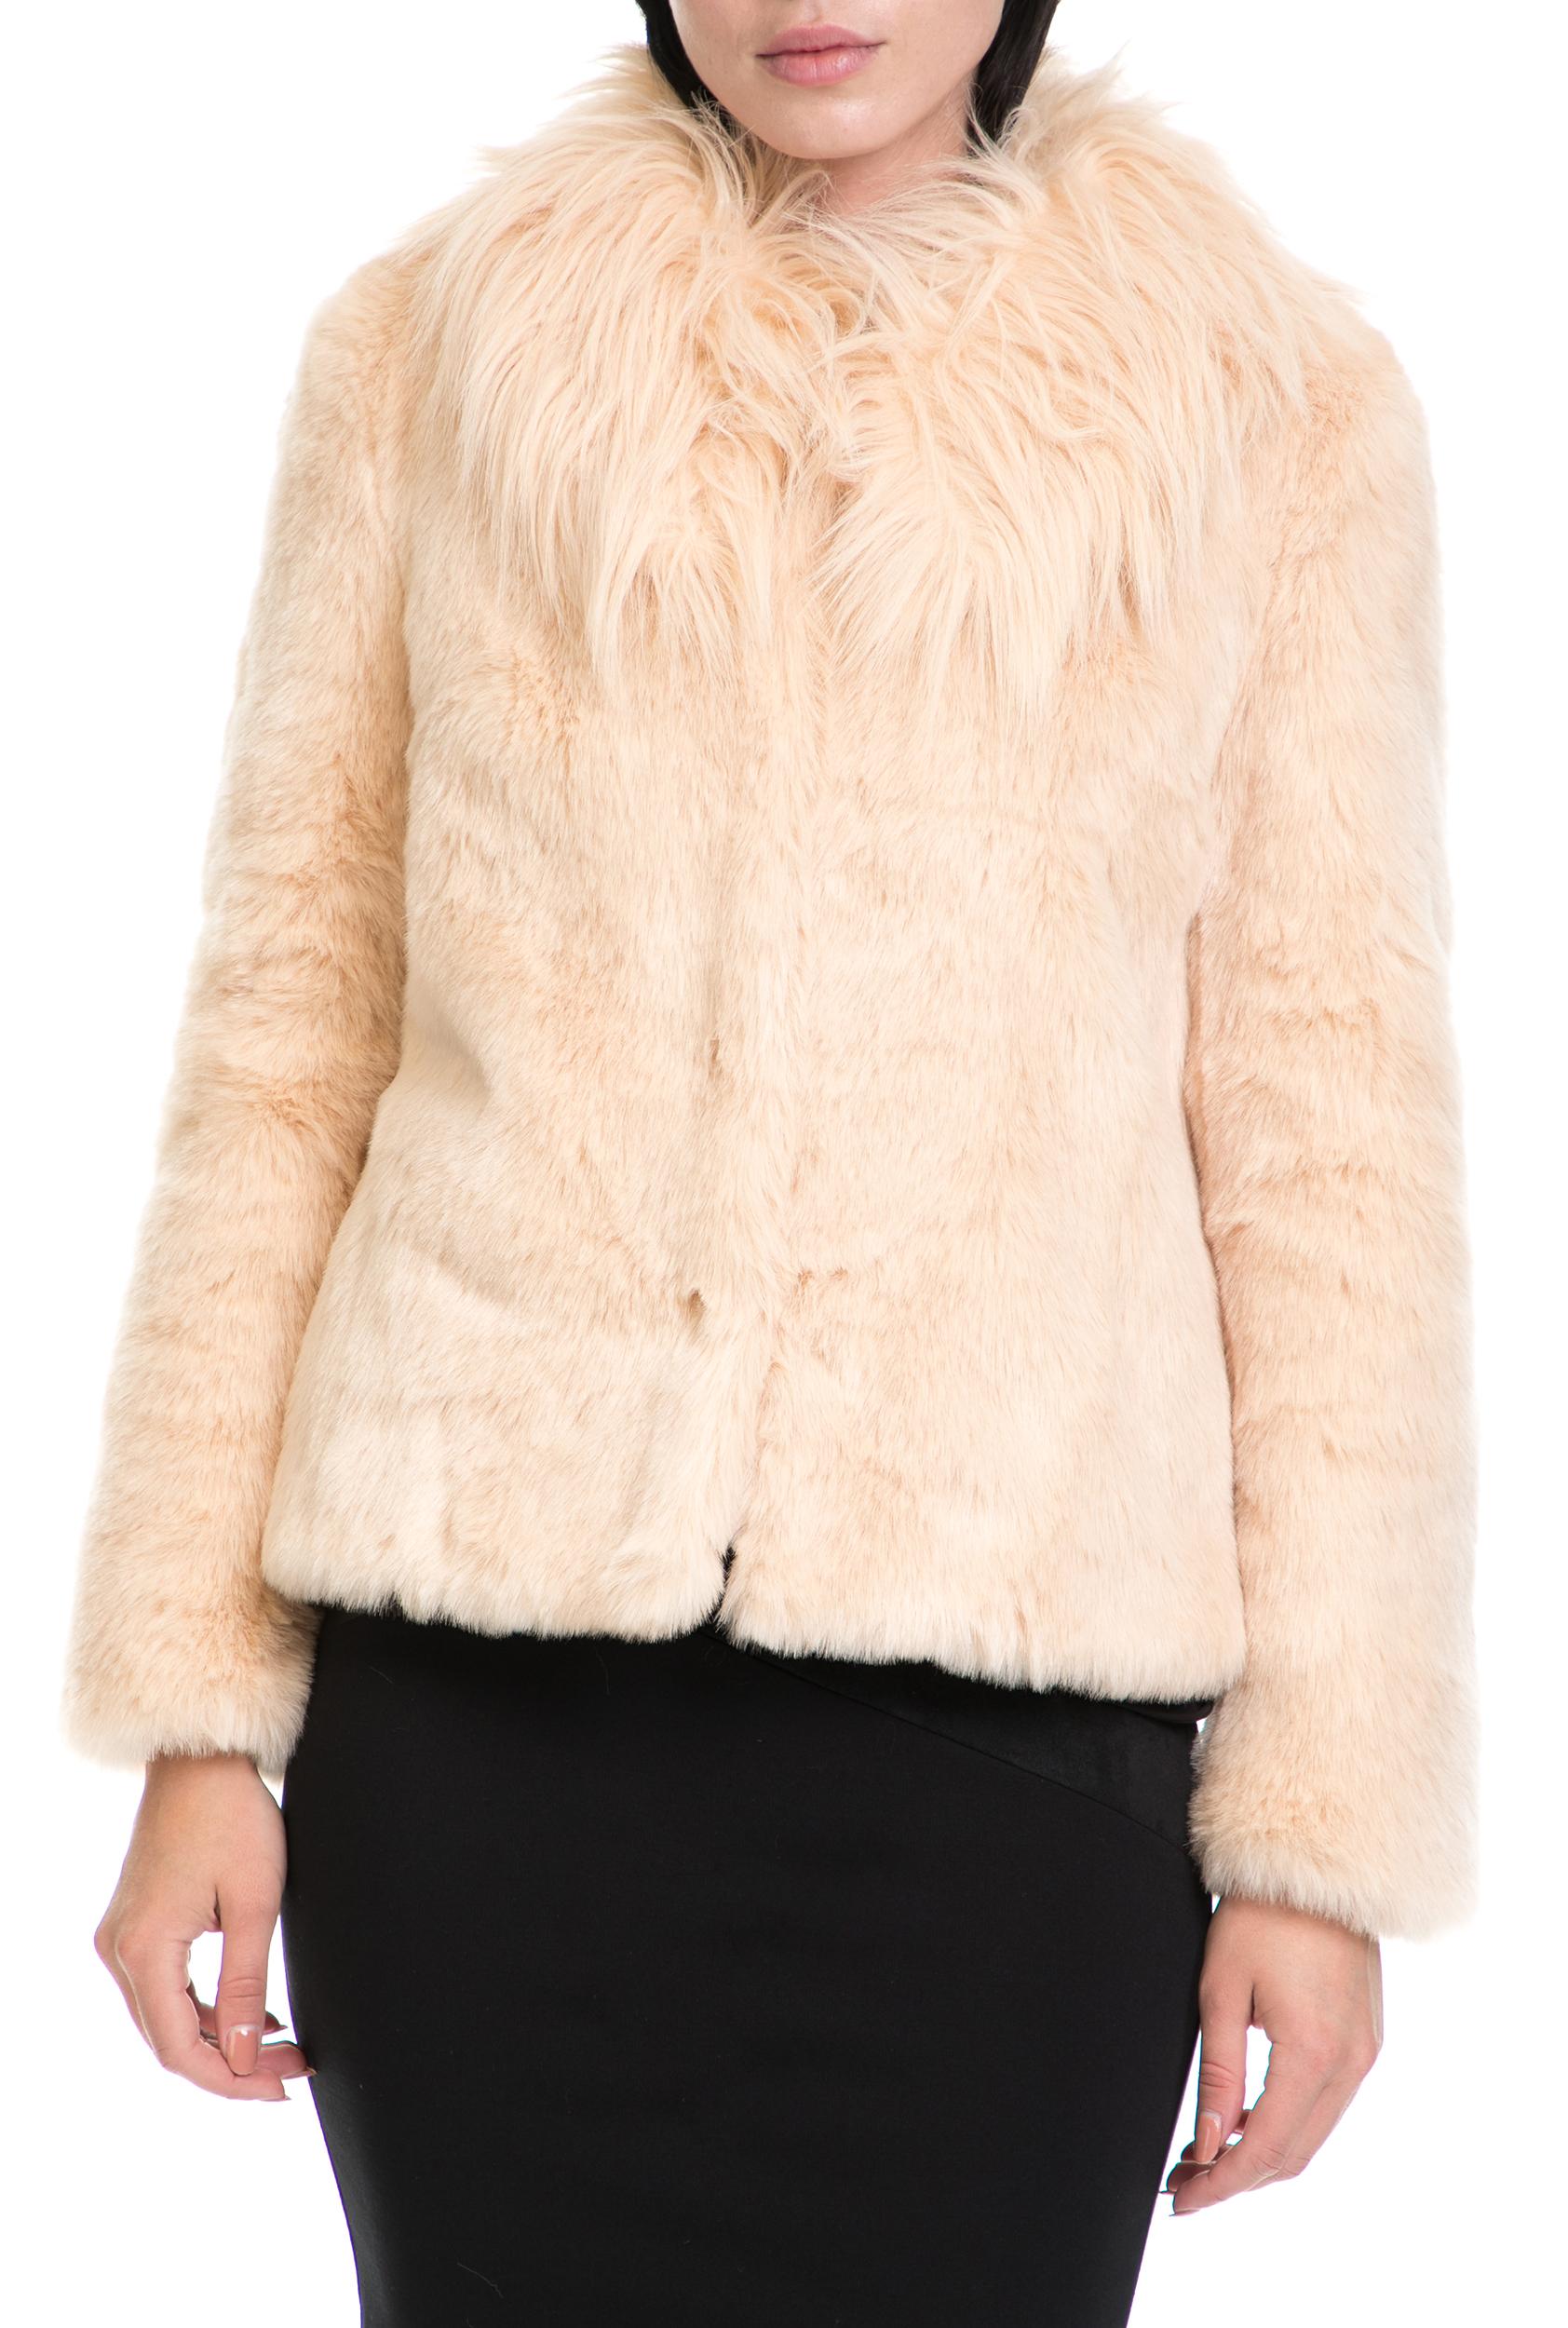 GUESS - Γυναικείο παλτό AGATA GUESS ροζ γυναικεία ρούχα πανωφόρια παλτό